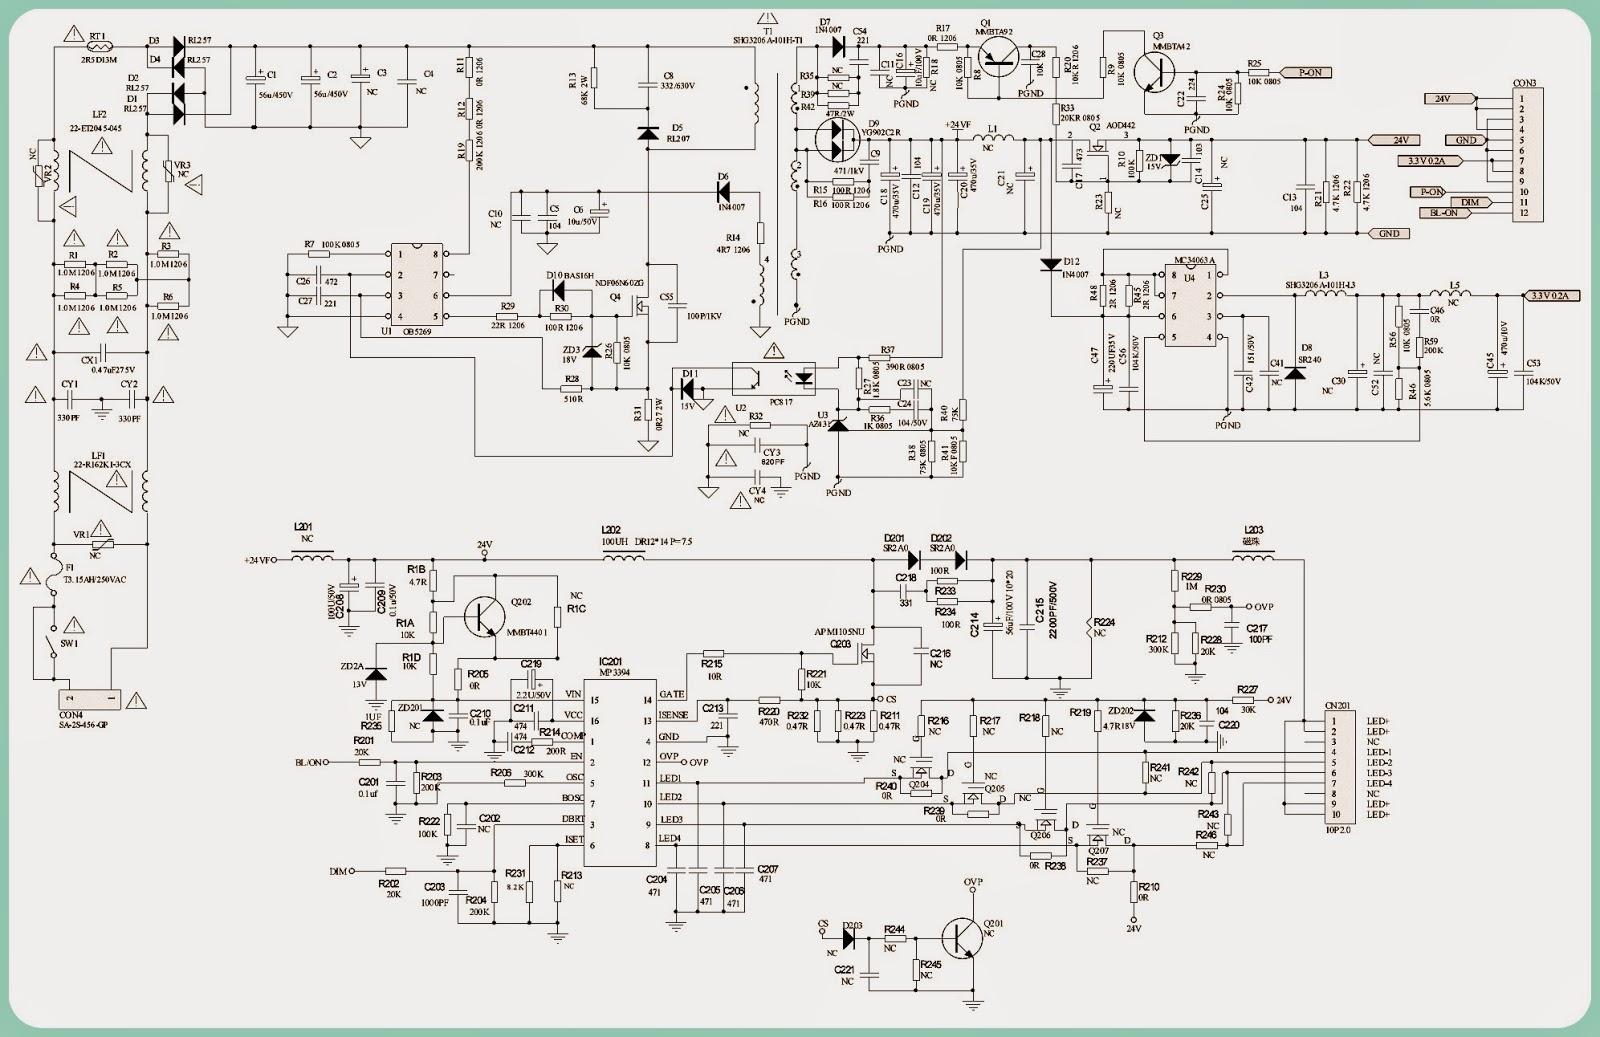 Sr Inverterblockdiagramlg Schematic Wiring